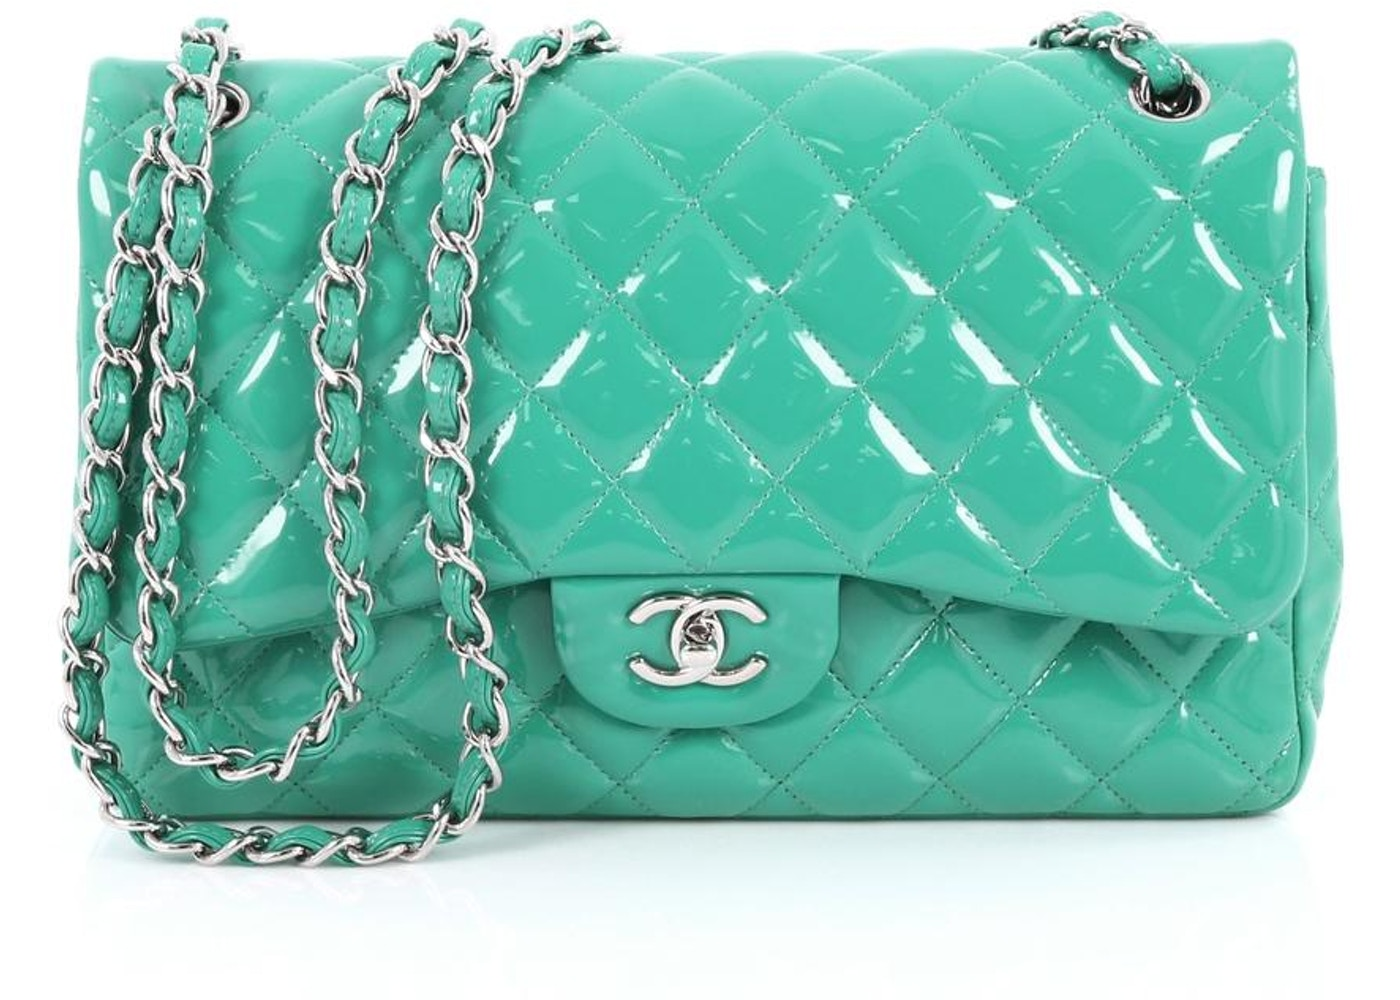 3efcff8c8f31b Chanel - Metallic Medium Classic Tweed Double Flap Bag Mint - Lyst .